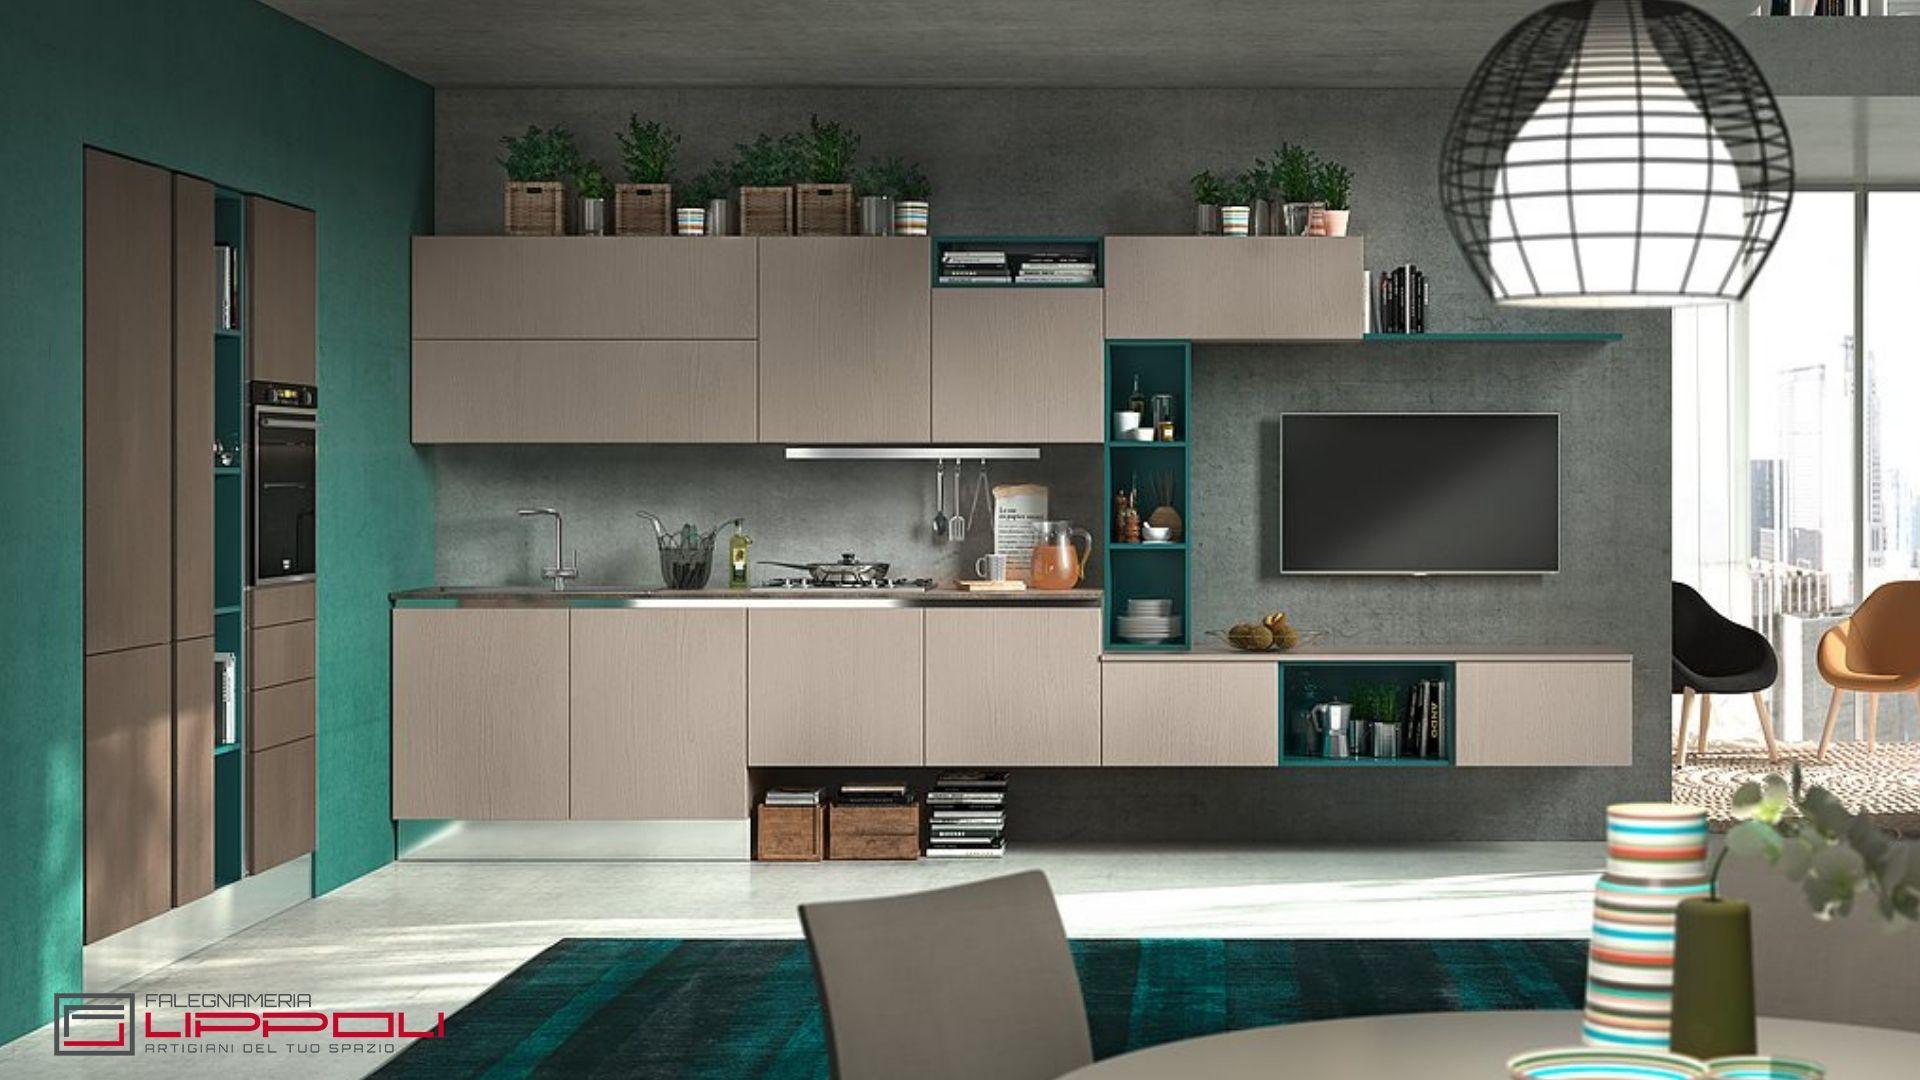 Idea arredamento cucina. | Lippoli Arredamenti | Pinterest ...